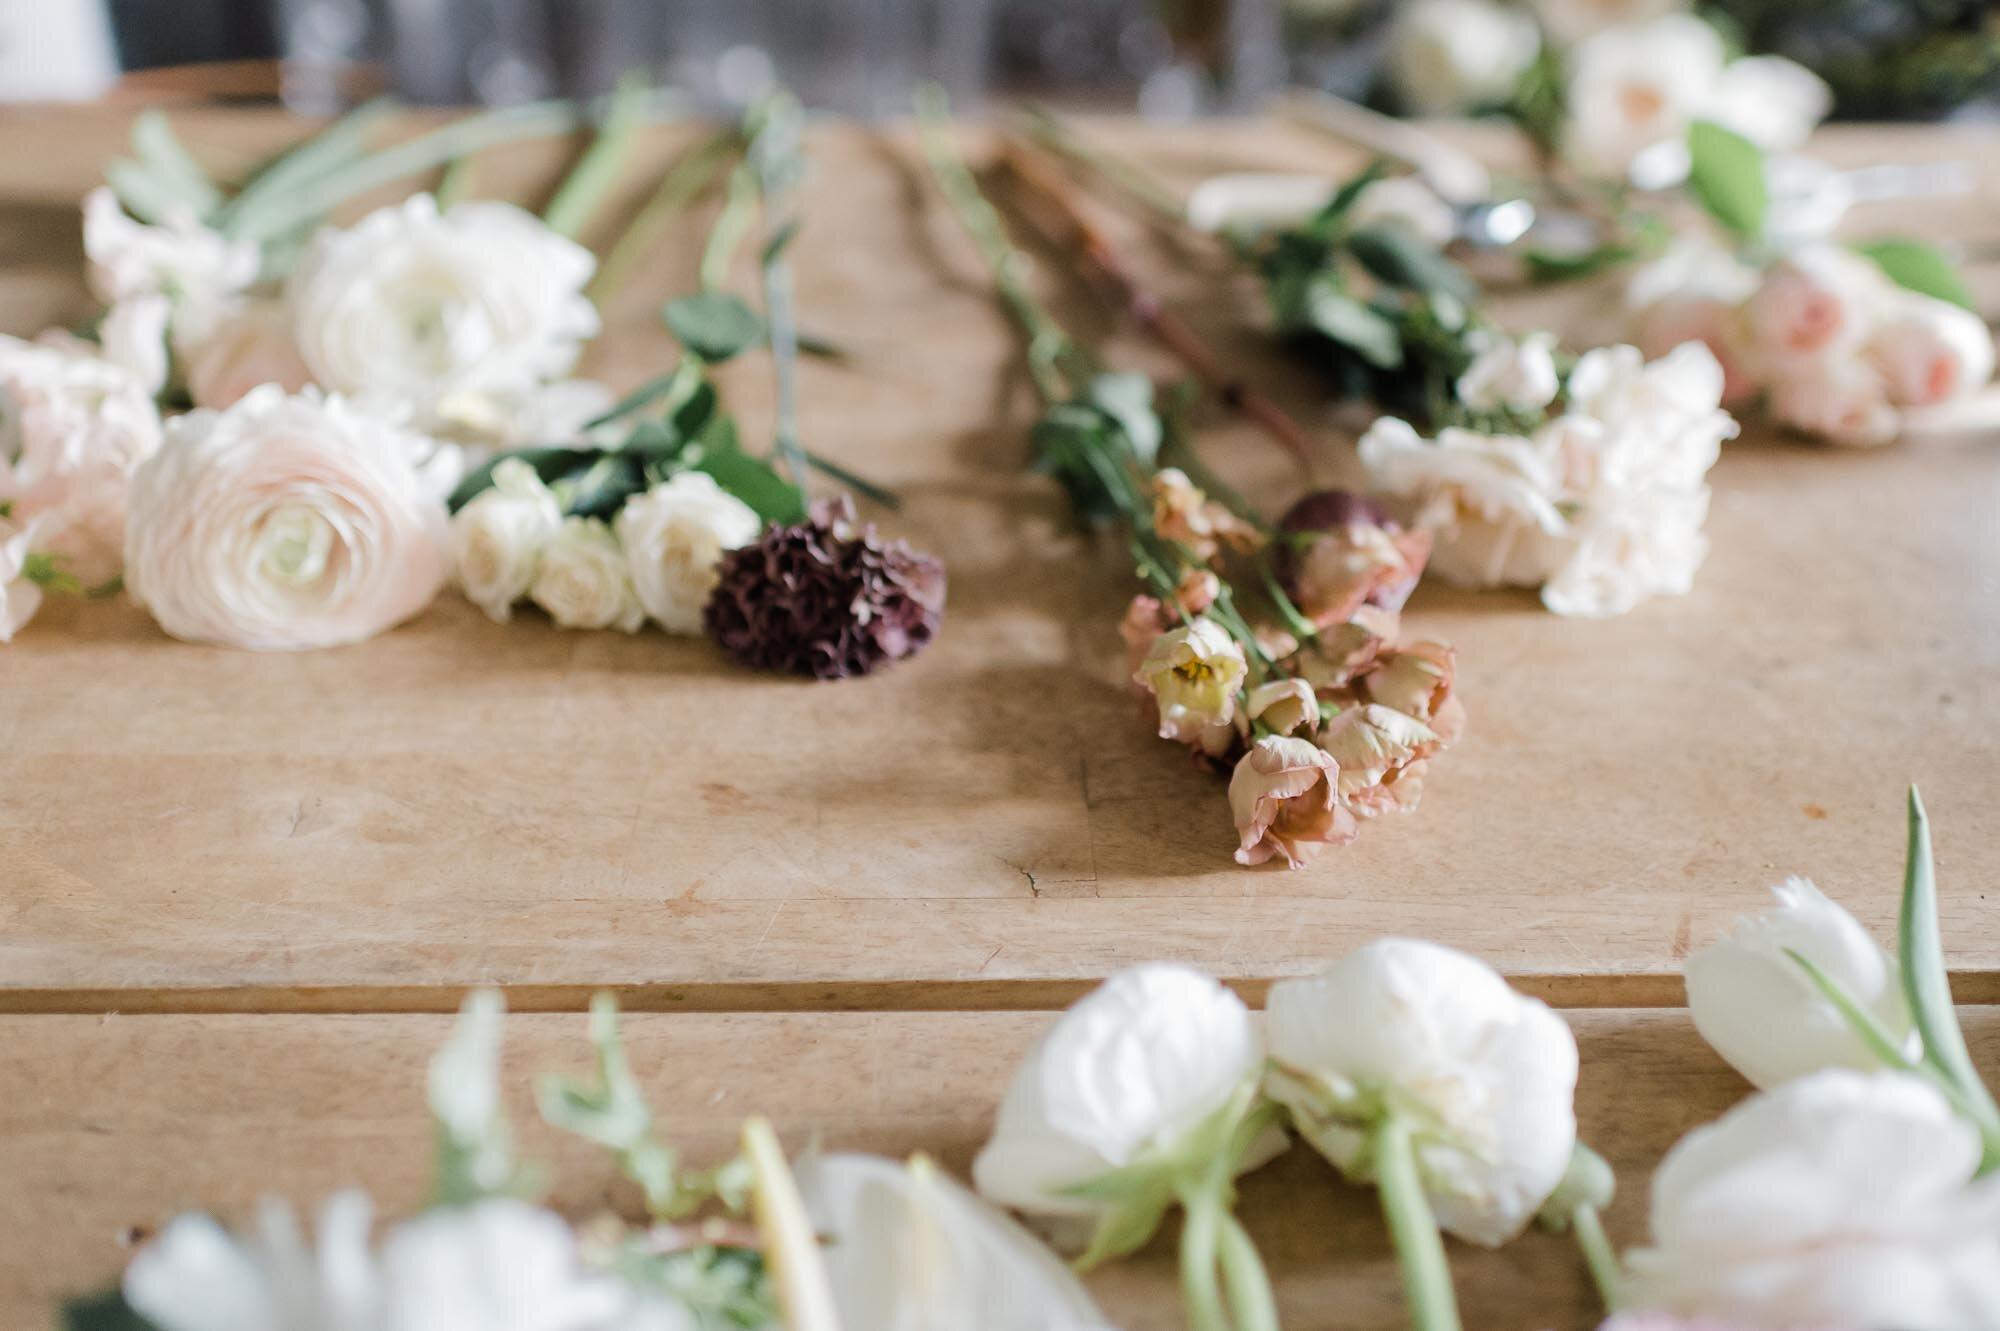 Let's talk flowers! -